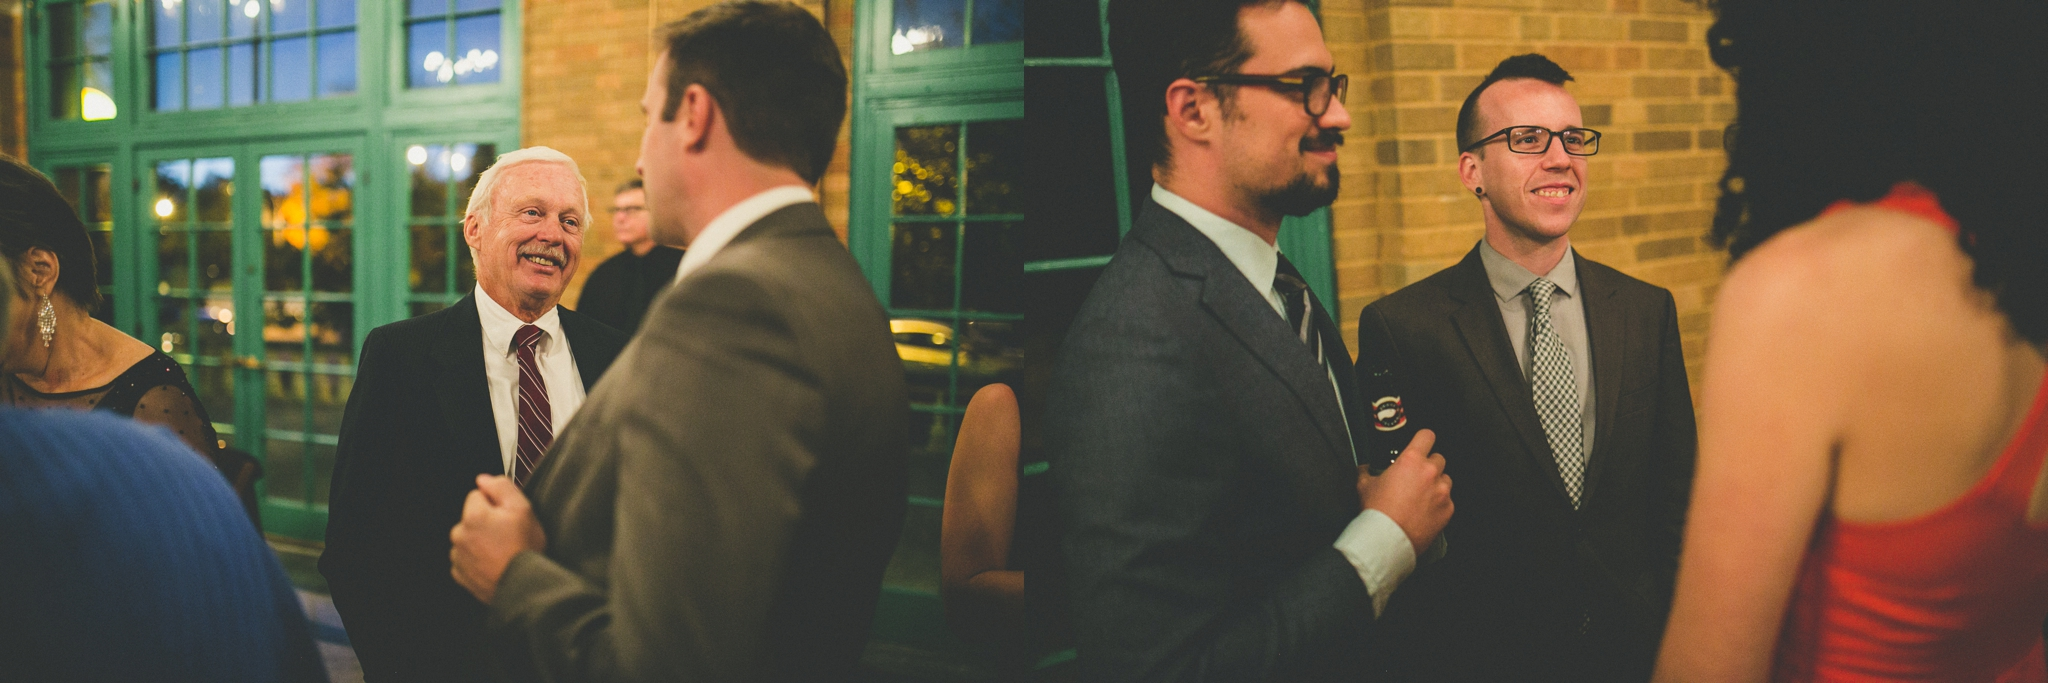 Columbus-Park-Refectory-Wedding-105.jpg